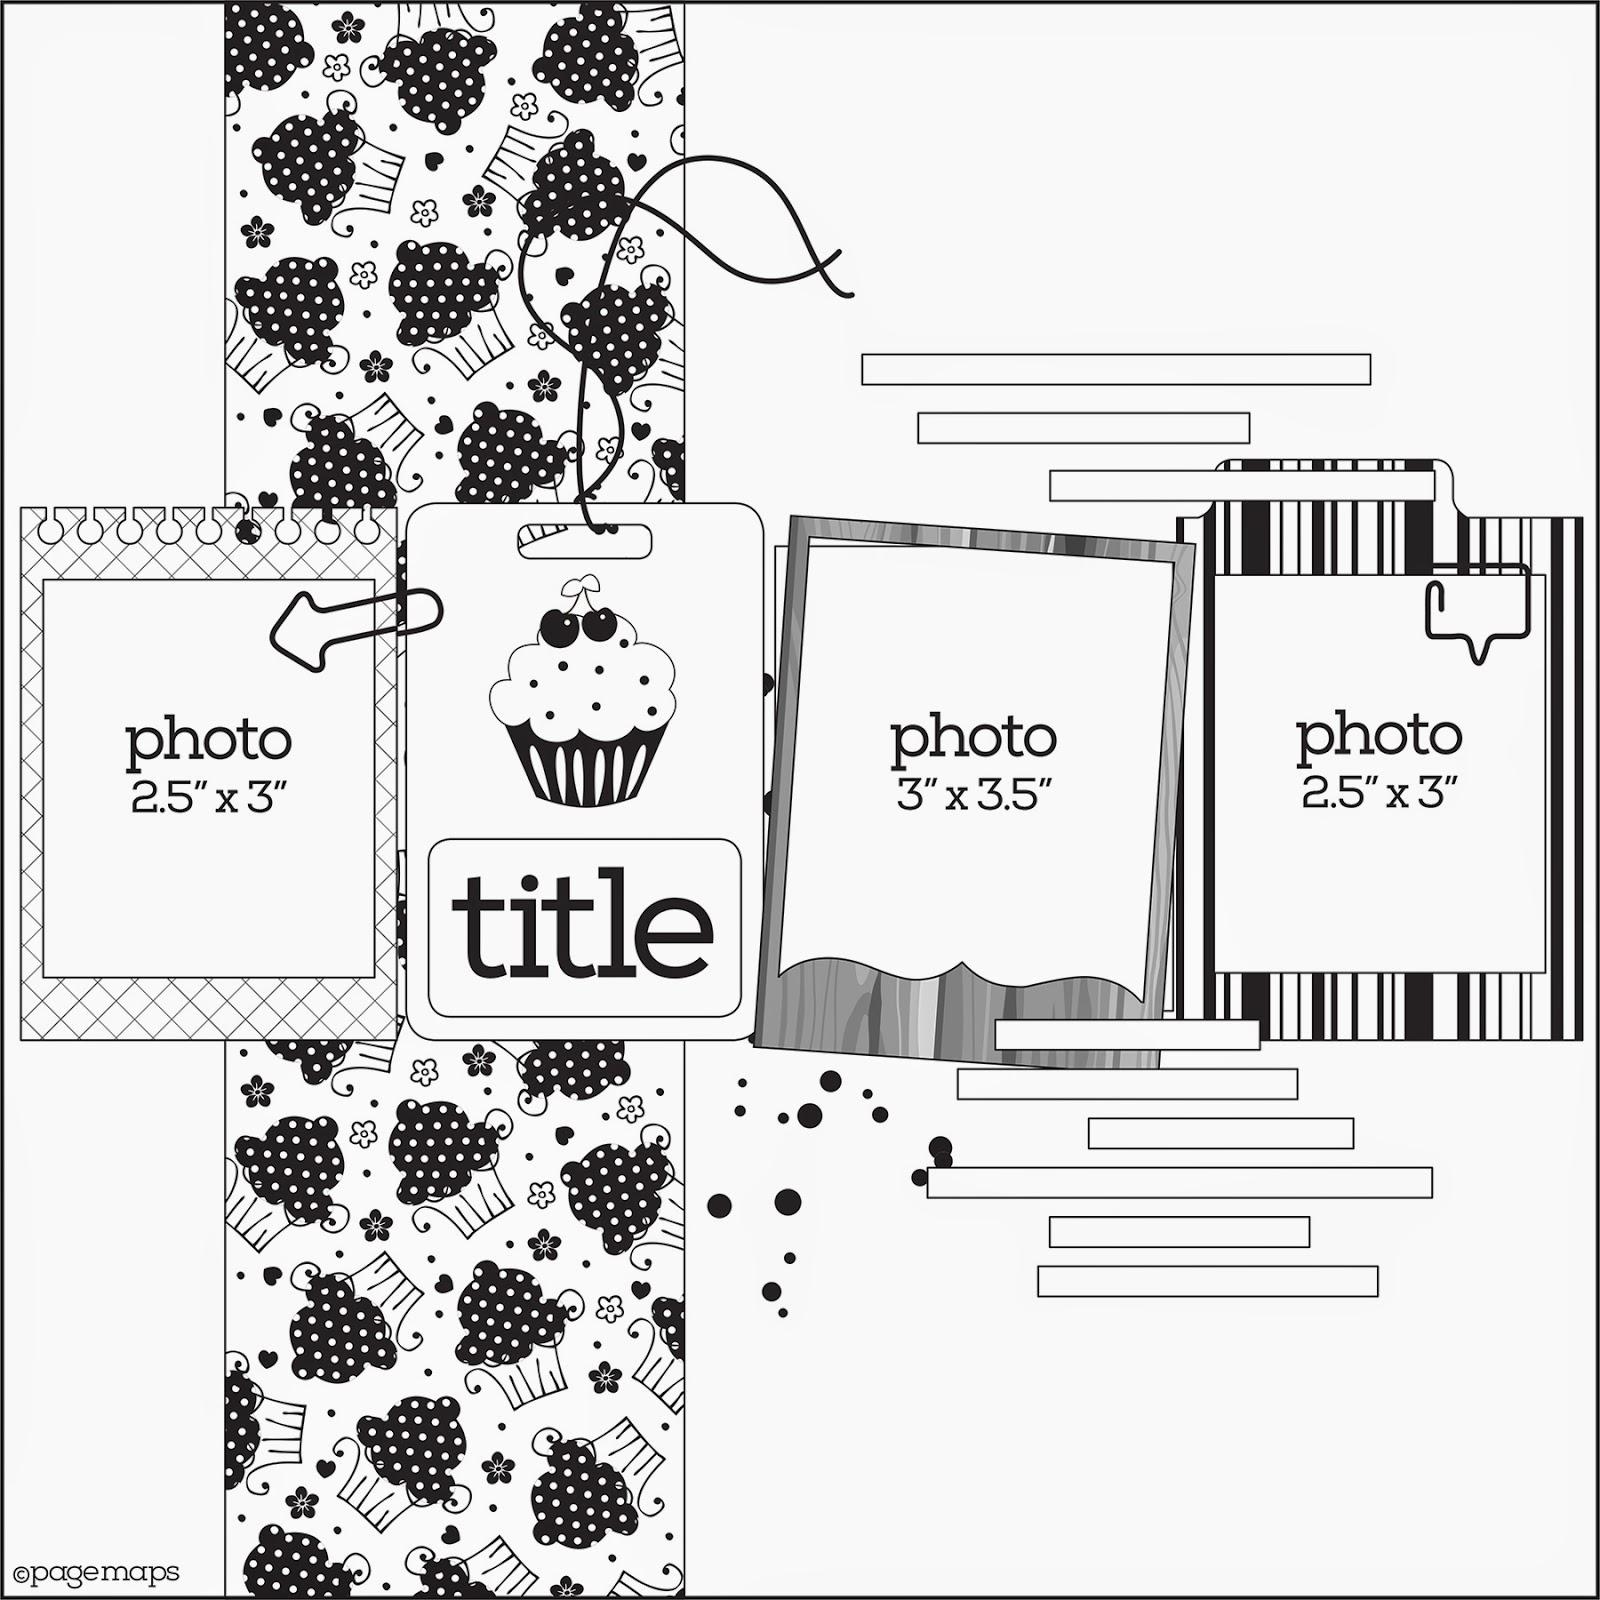 Baby Girl Scrapbook Layout created by Becki Adams @jbckadams #scrapbook #papercrafting #layout